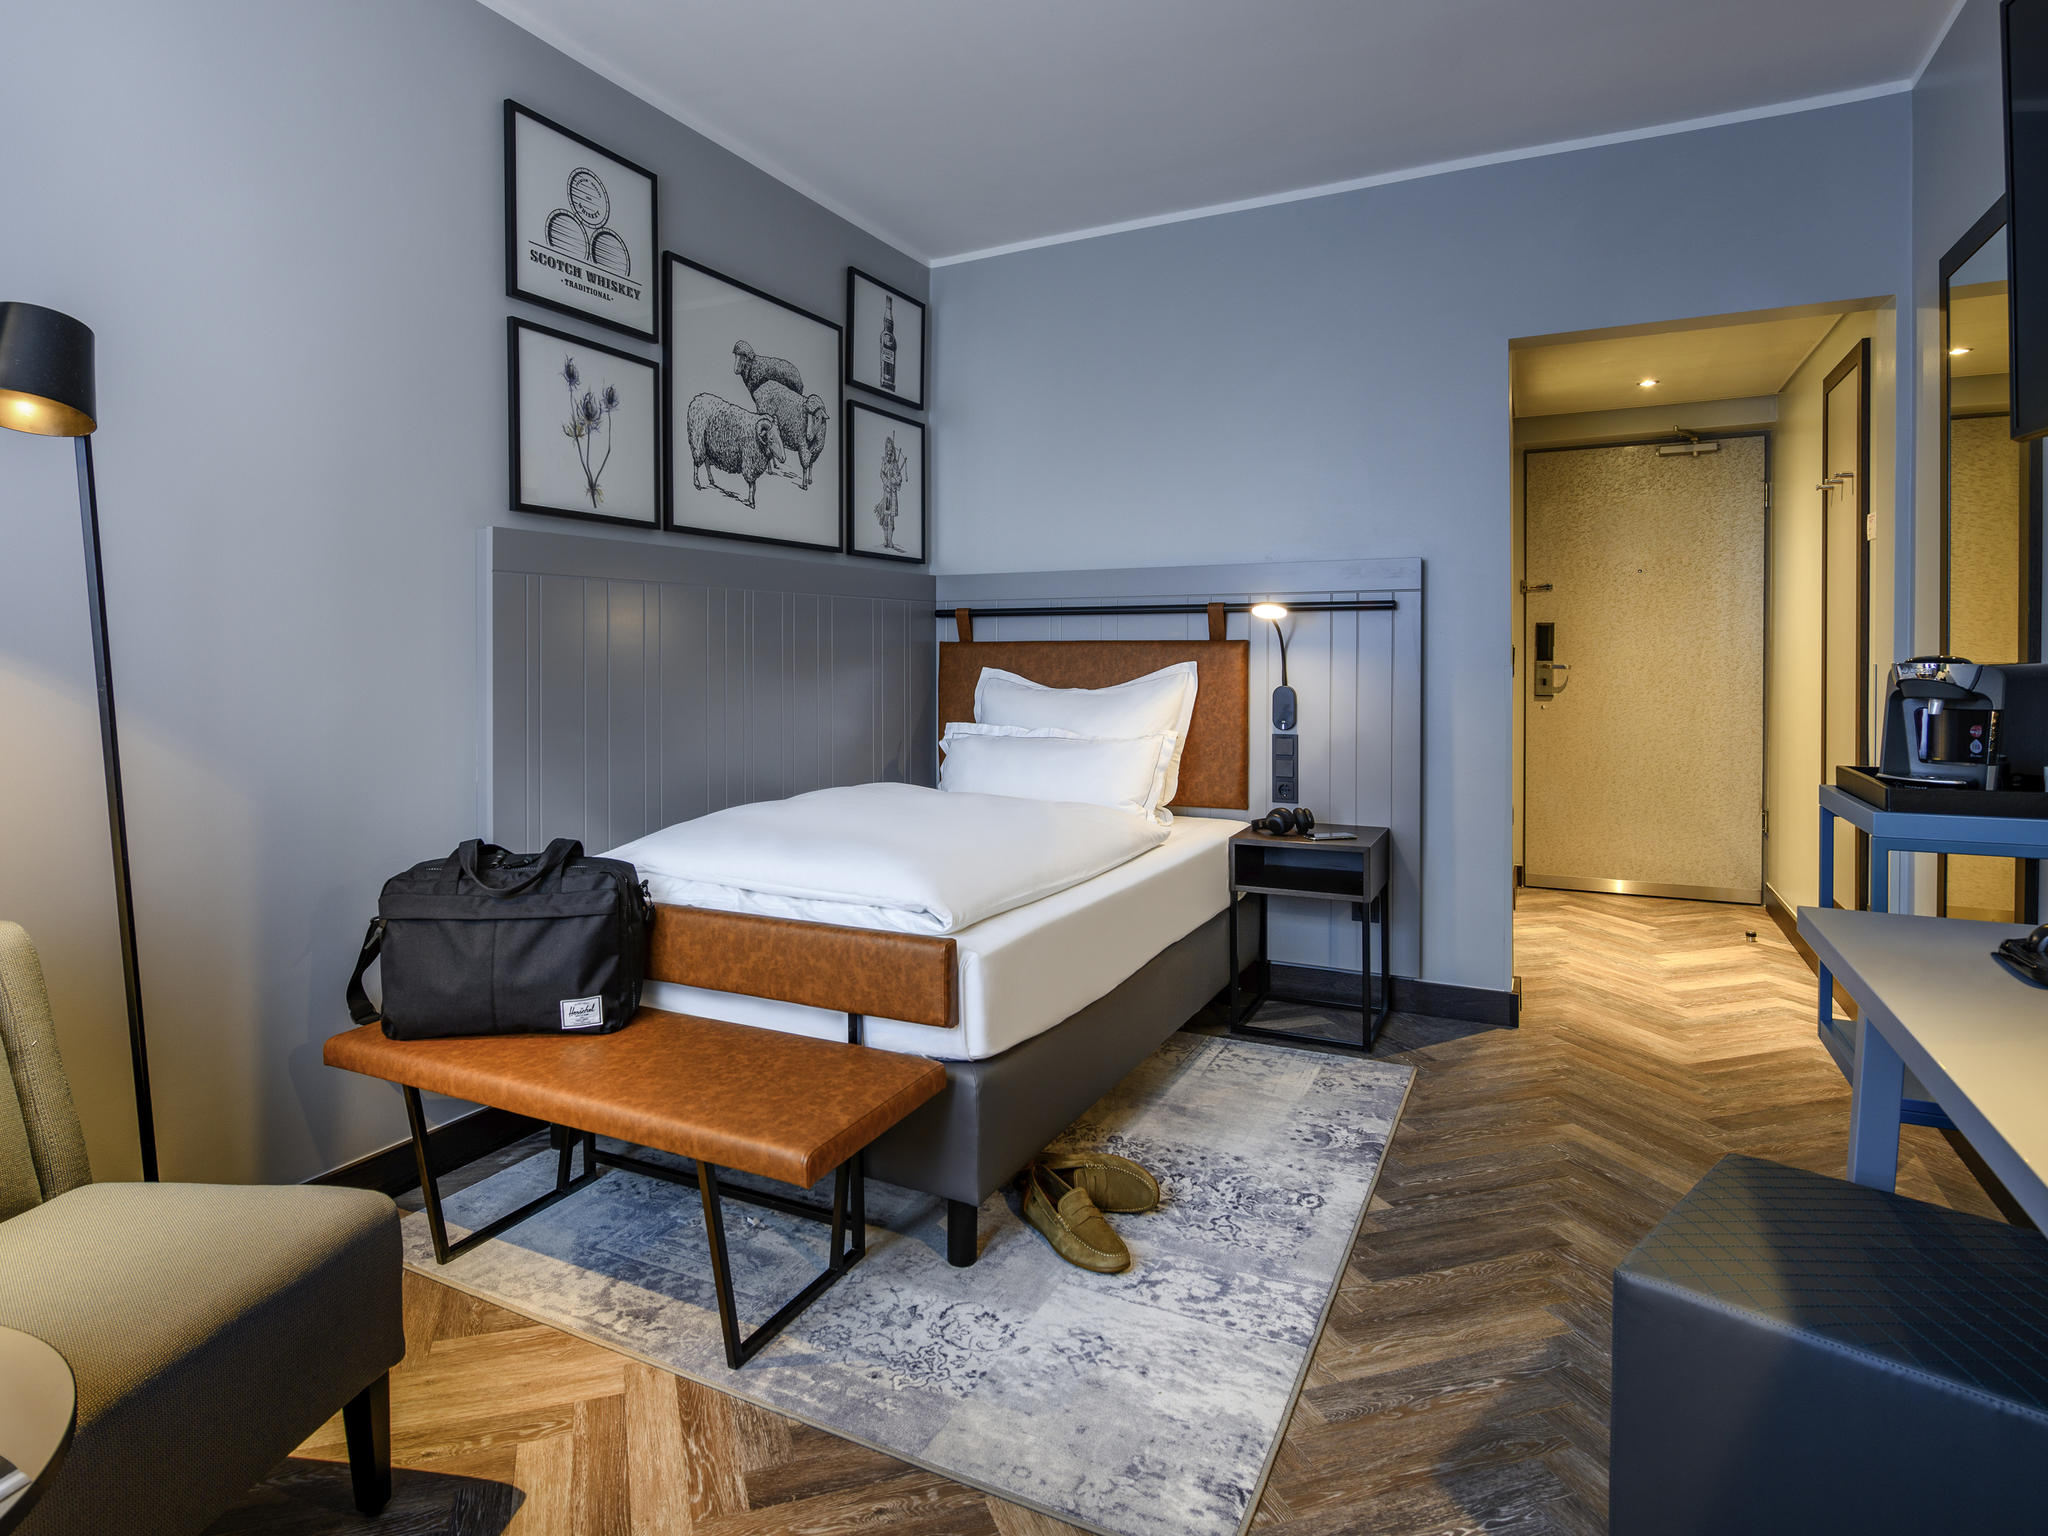 Hotel in DORTMUND - Mercure Hotel Dortmund Centrum